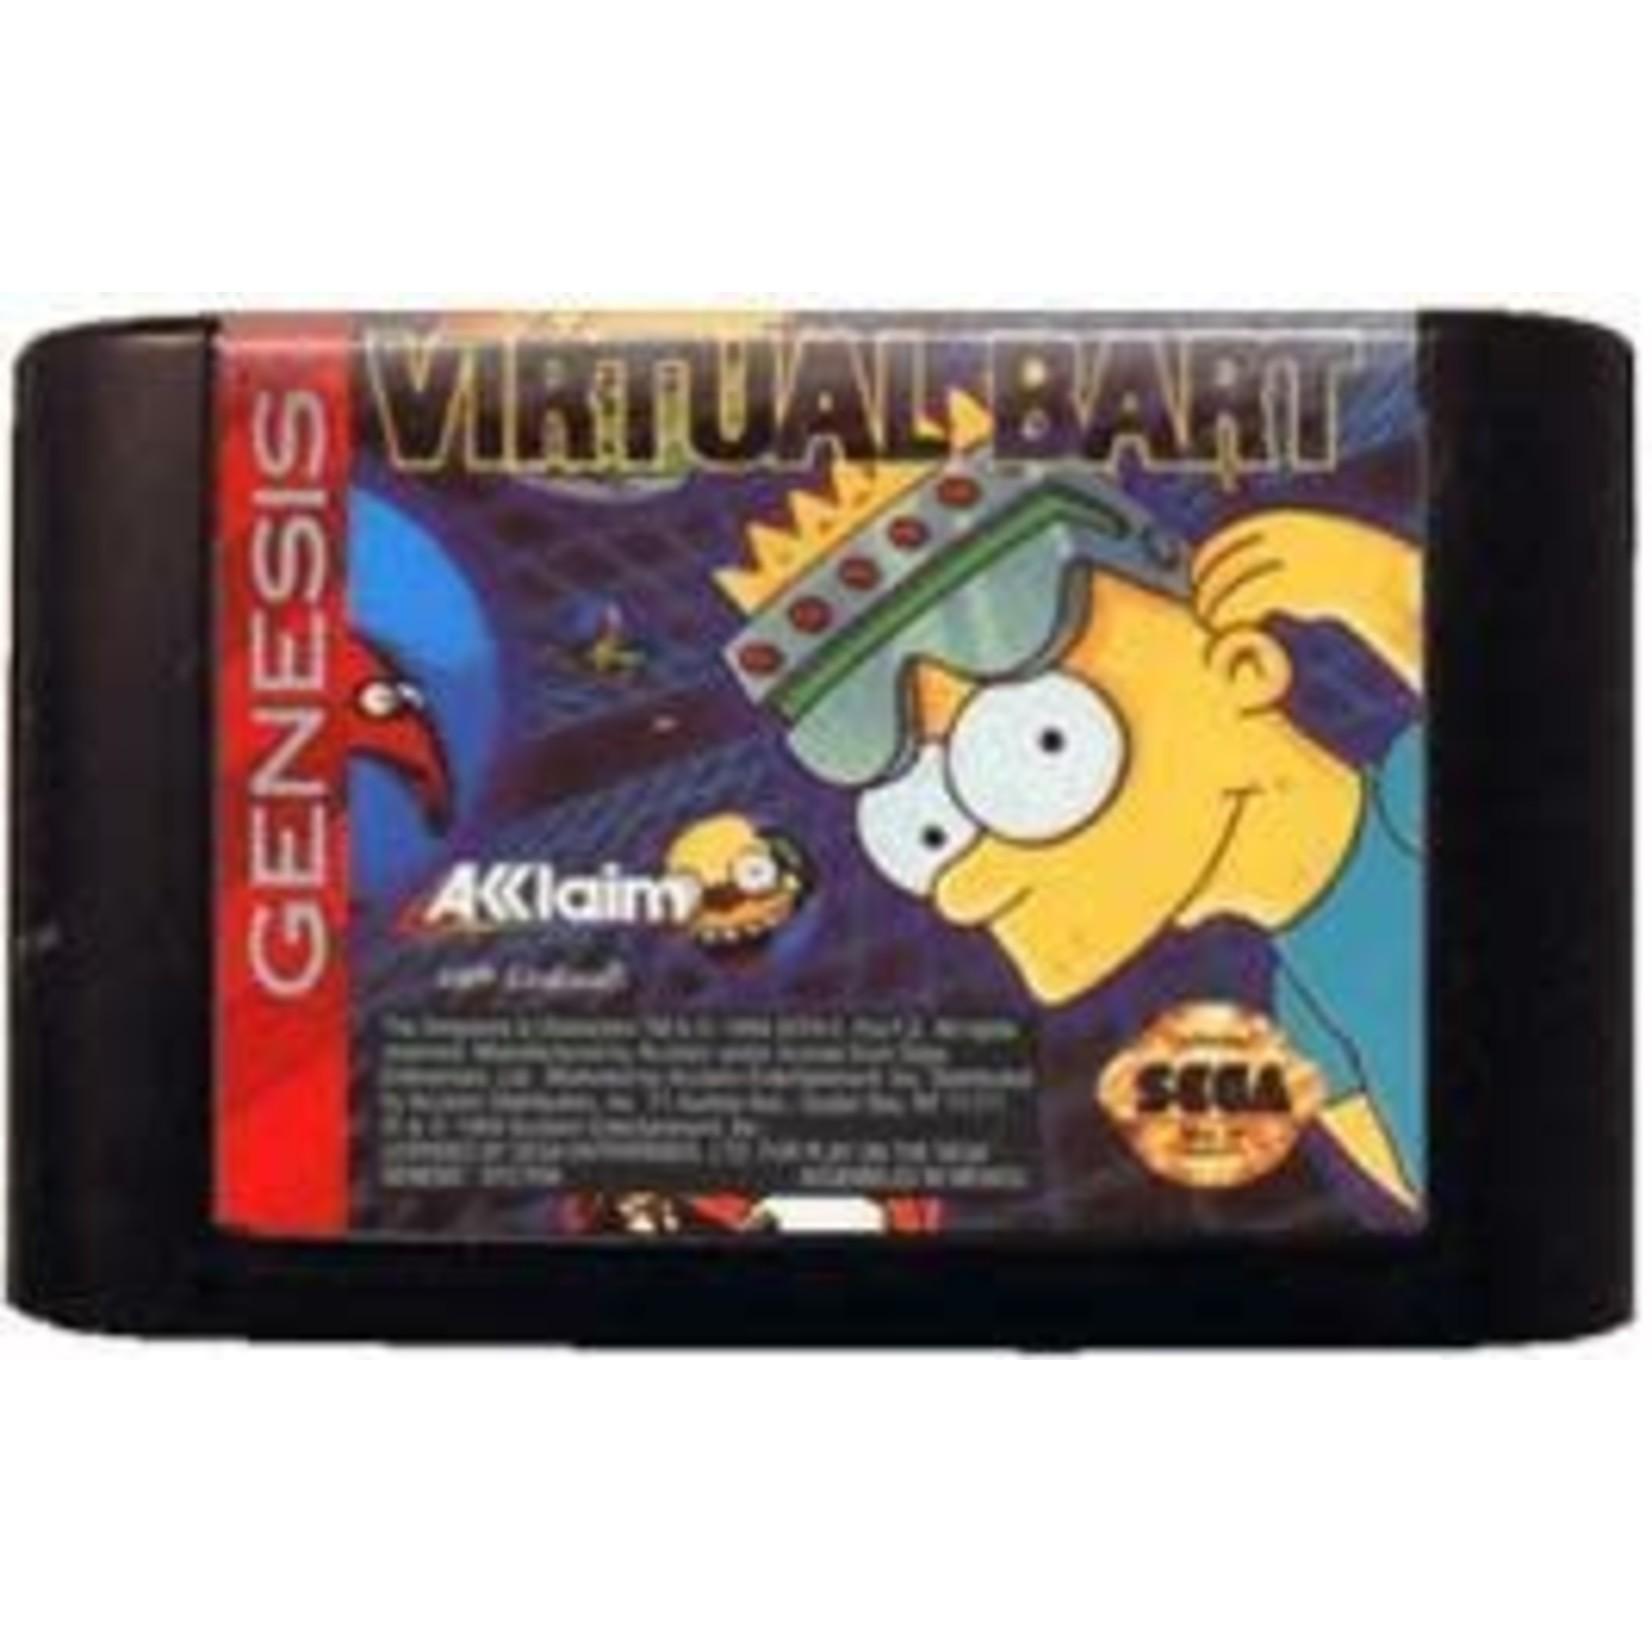 sgu-Virtual Bart (cartridge)